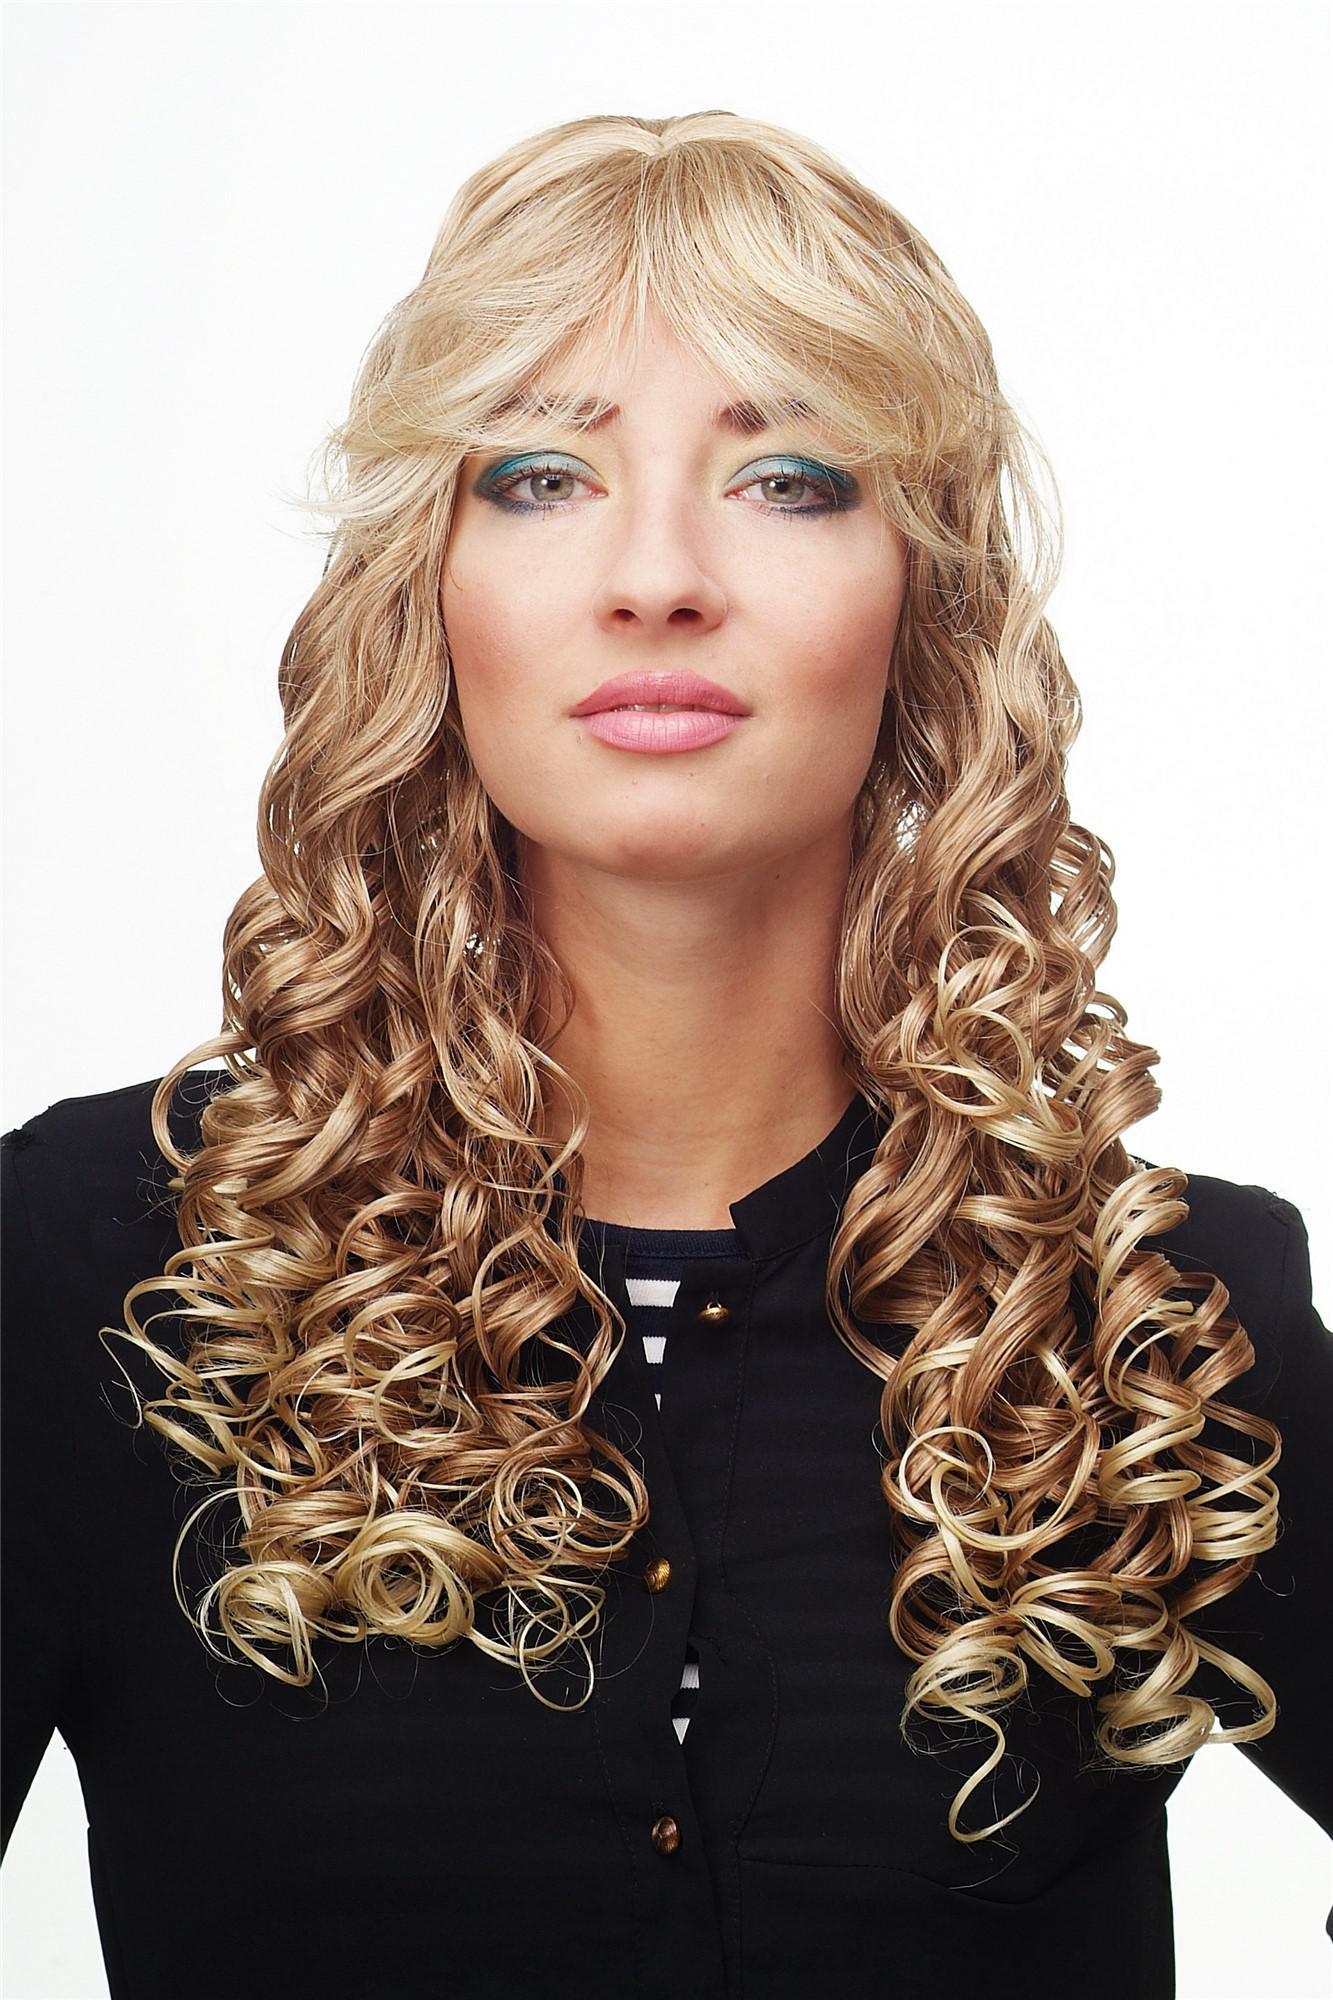 Damenperucke Perucke Blond Mischung Lang Korkenzieher Locken Pony Dw89 27t613